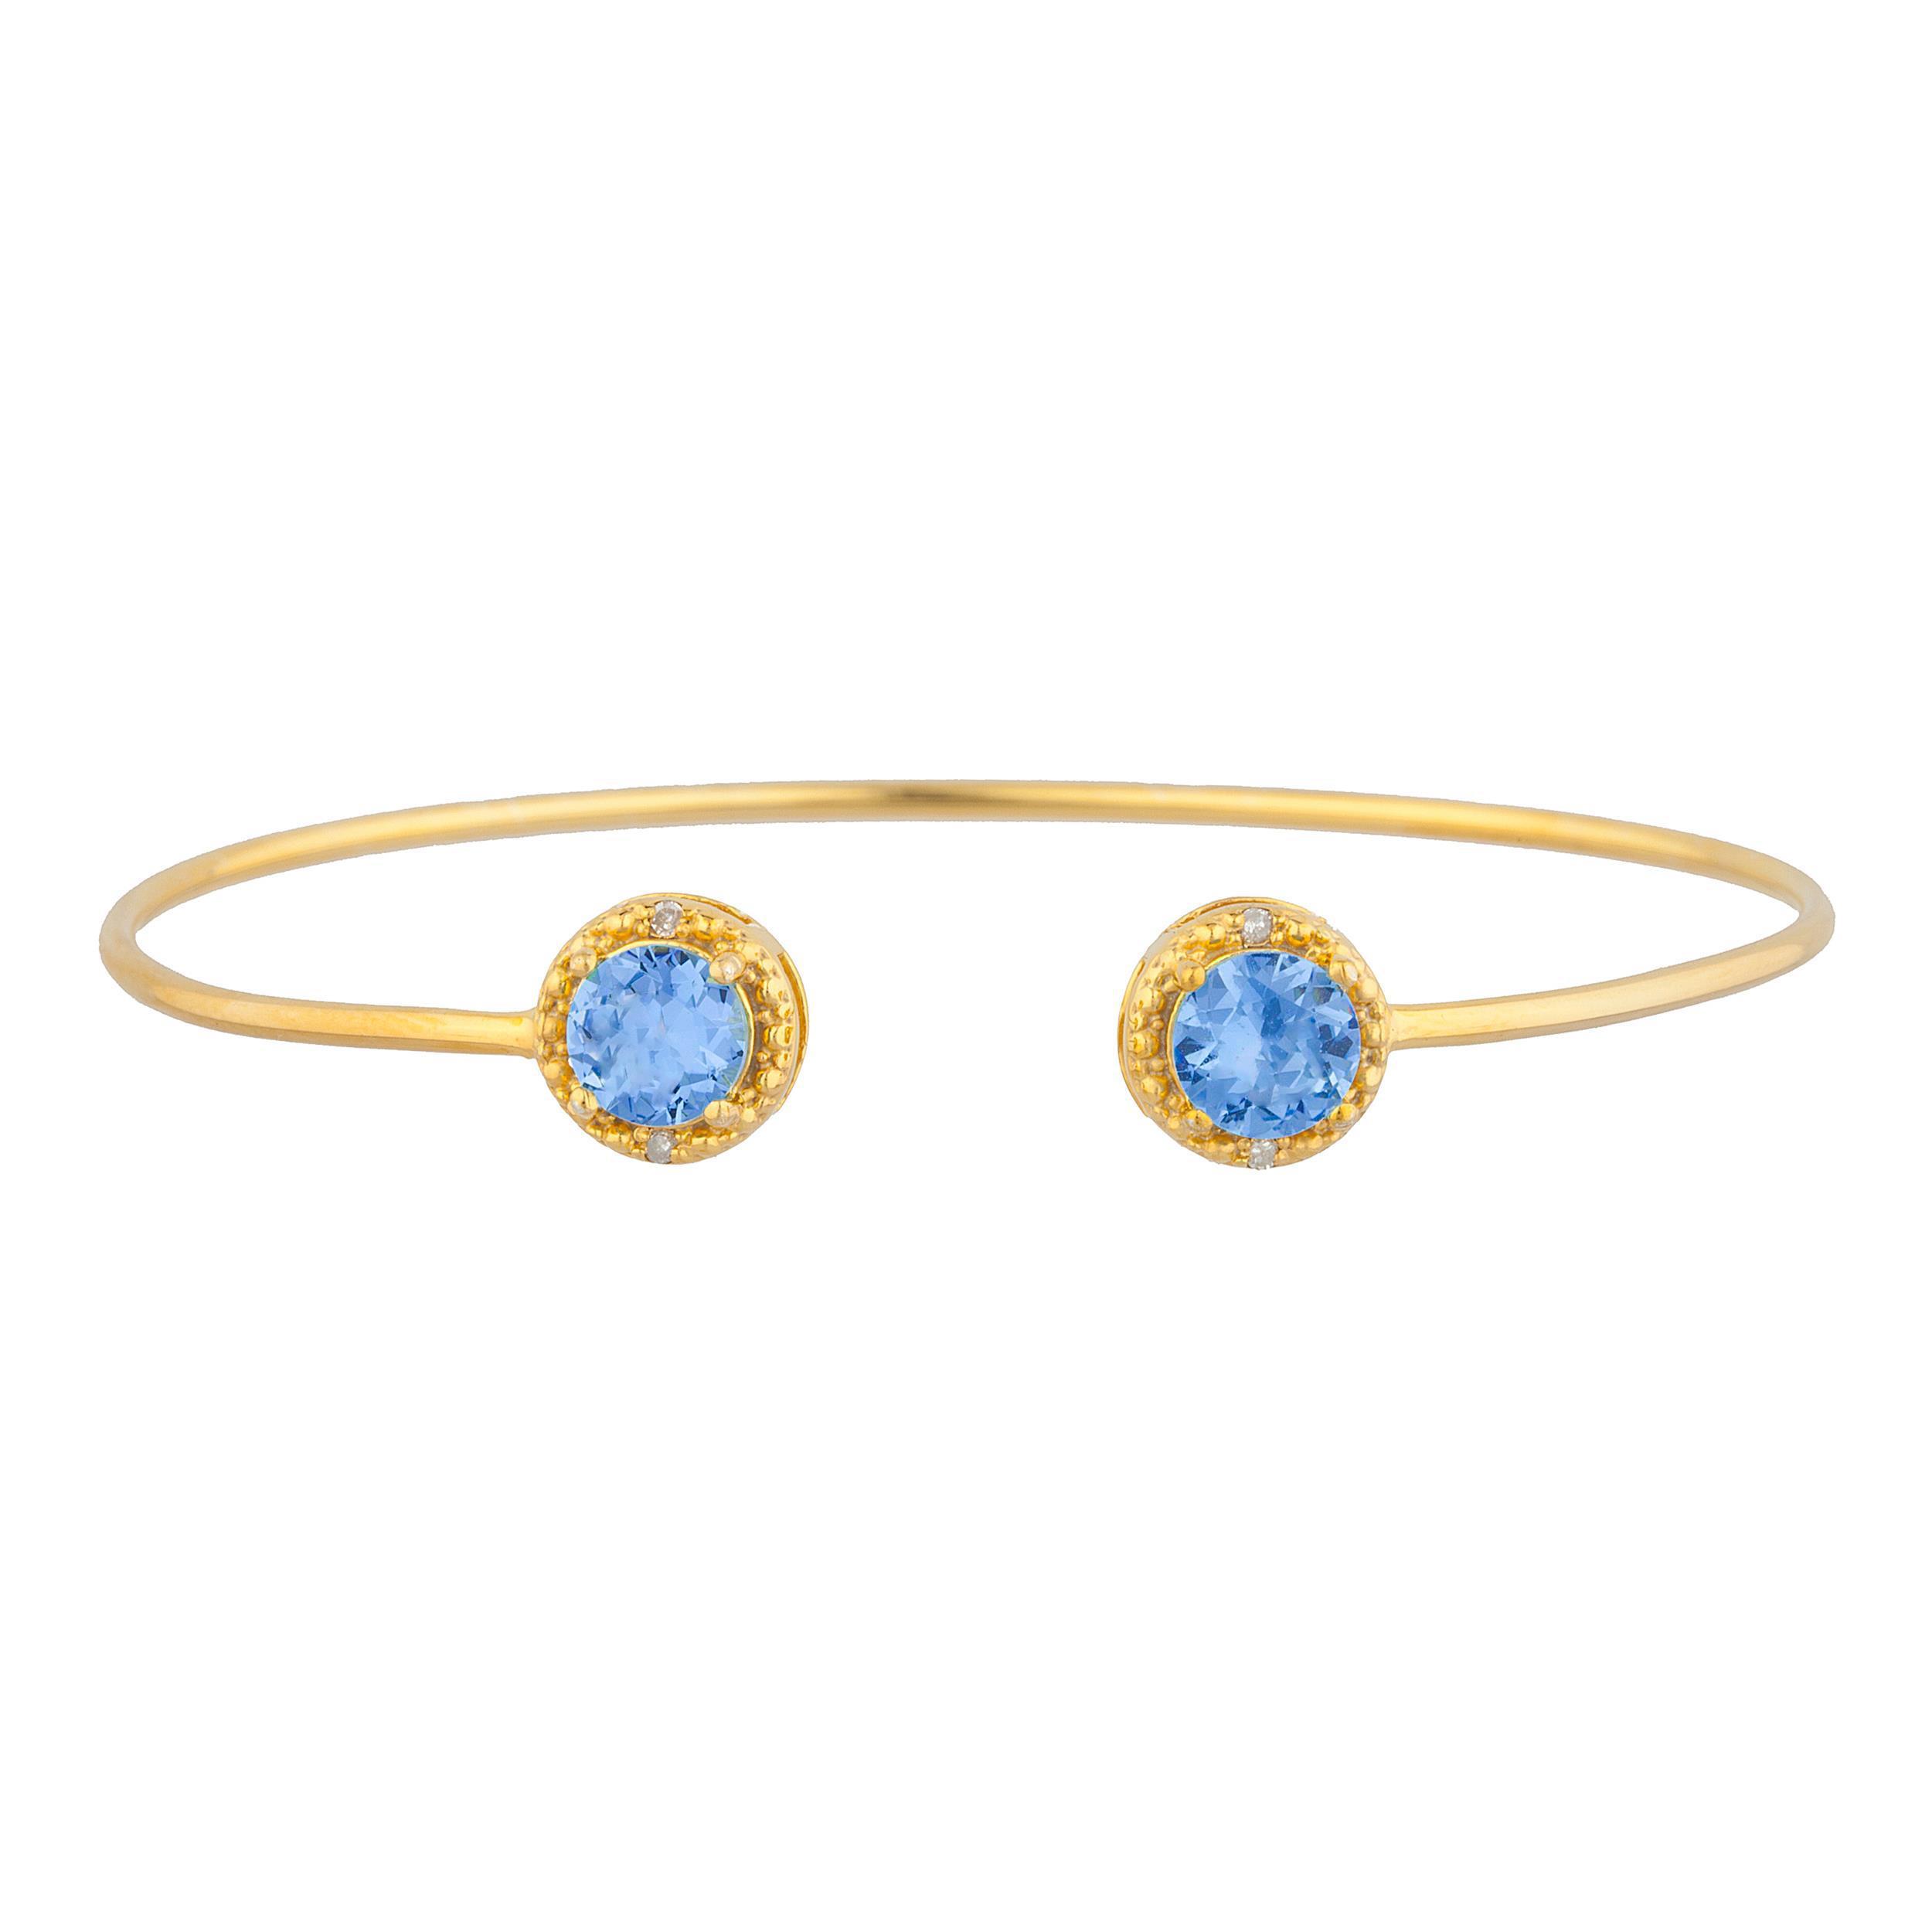 14Kt Yellow Gold Plated Tanzanite & Diamond Round Bangle Bracelet by Elizabeth Jewelry Inc